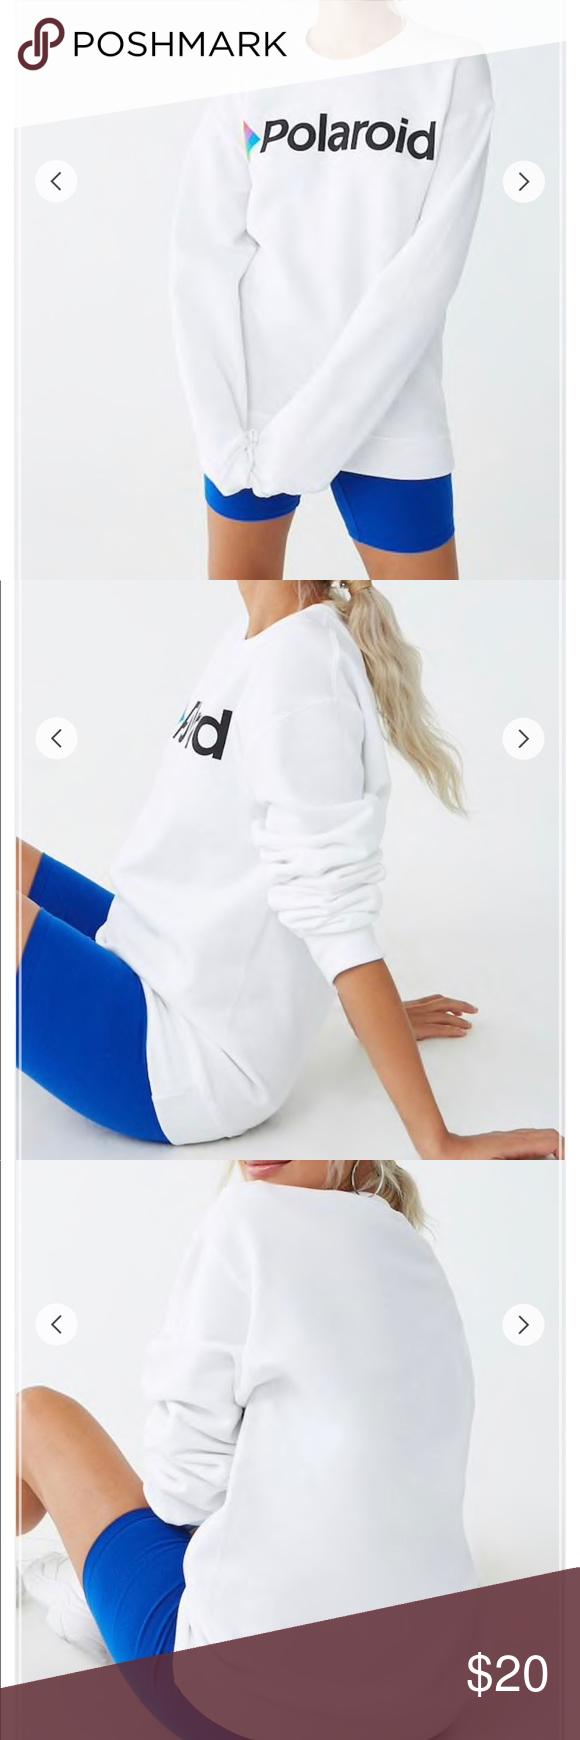 d985a475e4e Fleece Polaroid Graphic Sweatshirt • White/black • A fleece backed knit  sweatshirt that has